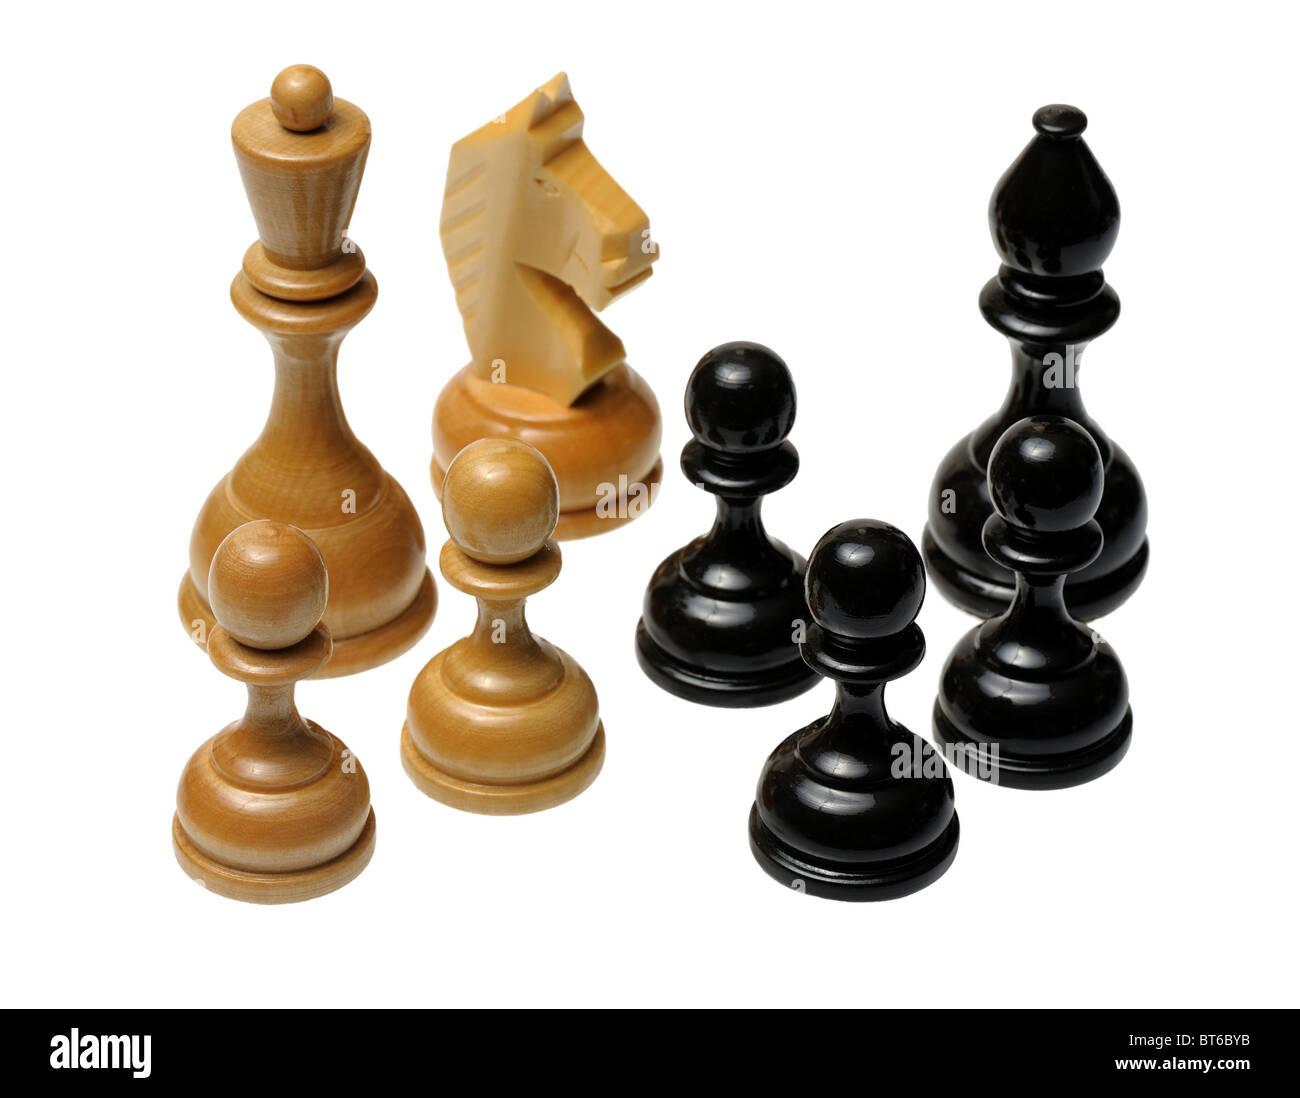 Chessmen - Stock Image